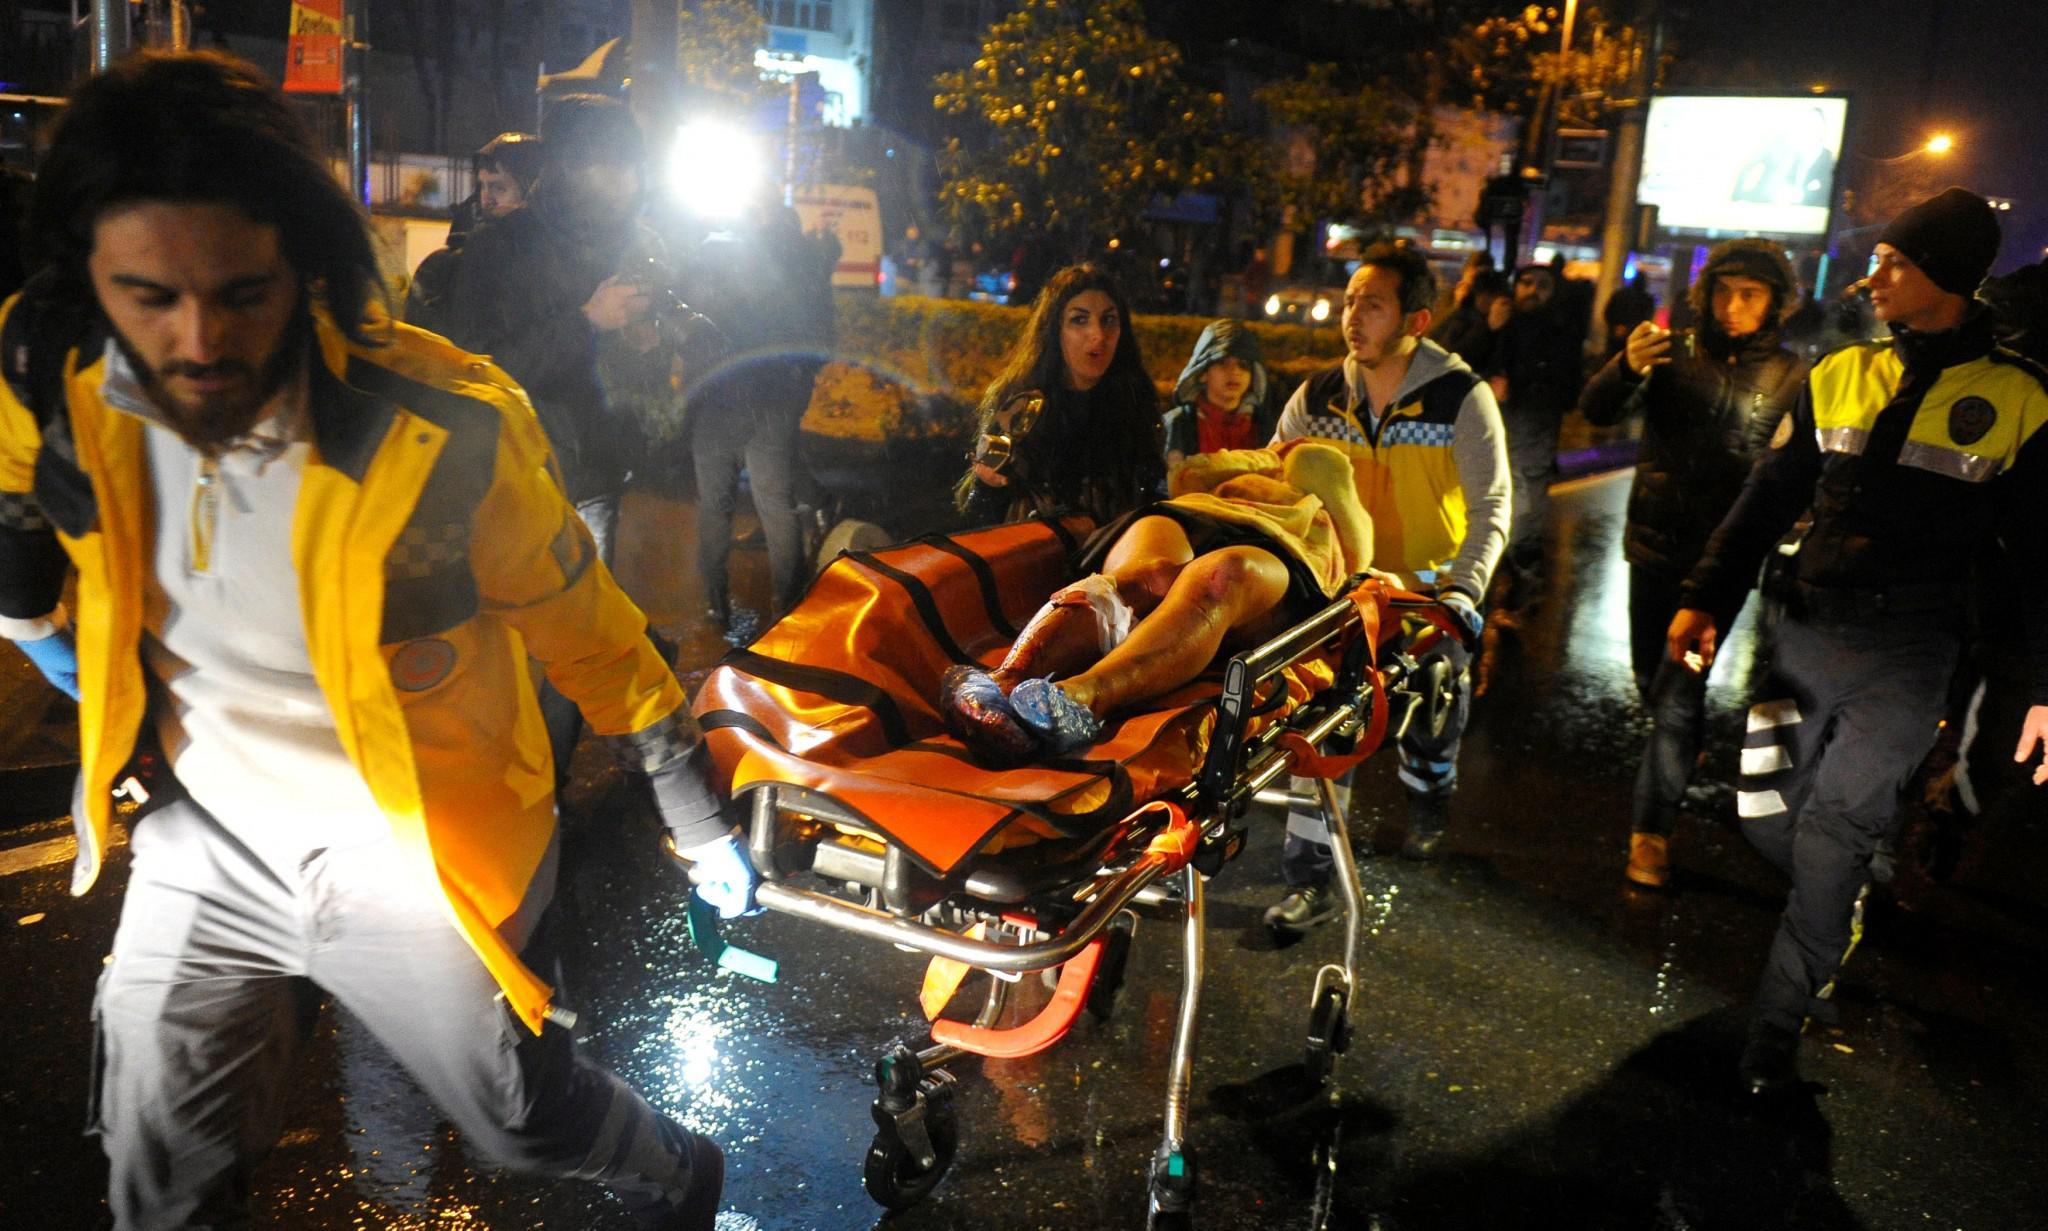 tourkia-epithesi-klamp-nekroi-3 Το Ισλαμικό Κράτος ανέλαβε την ευθύνη για το μακελειό στην Κωνσταντινούπολη